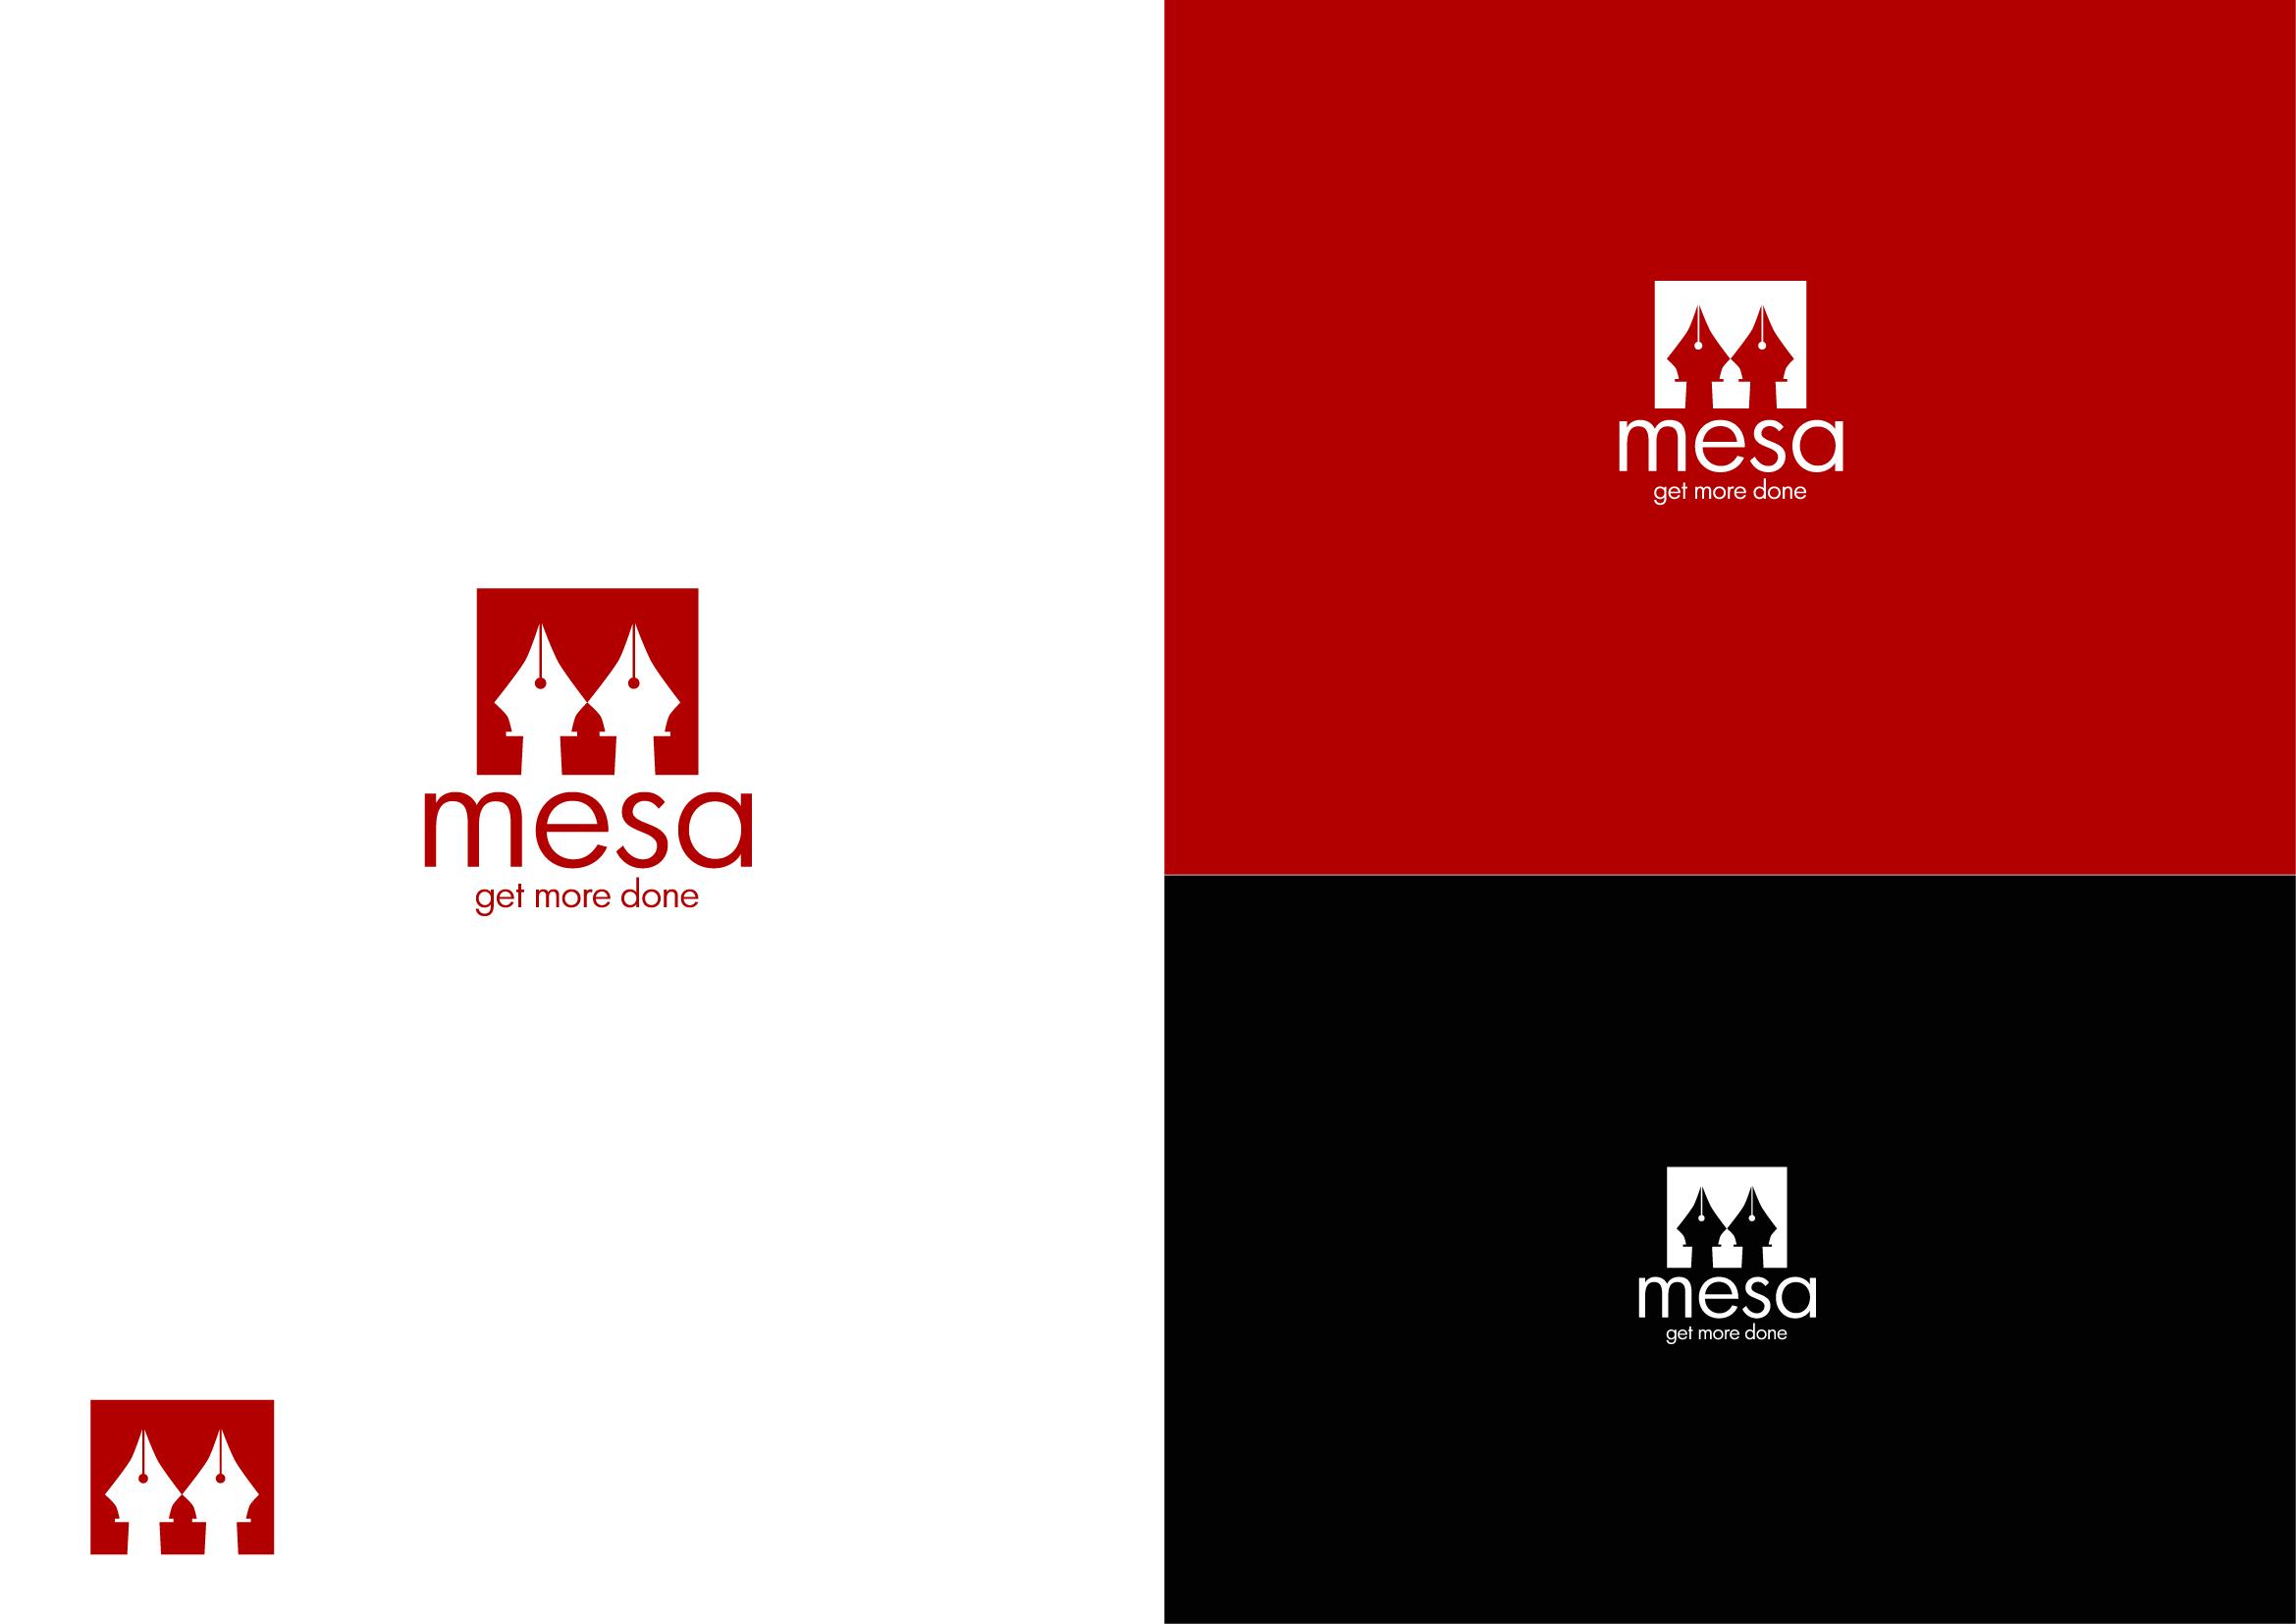 Logo Design by Osi Indra - Entry No. 89 in the Logo Design Contest Logo Design for Mesa.